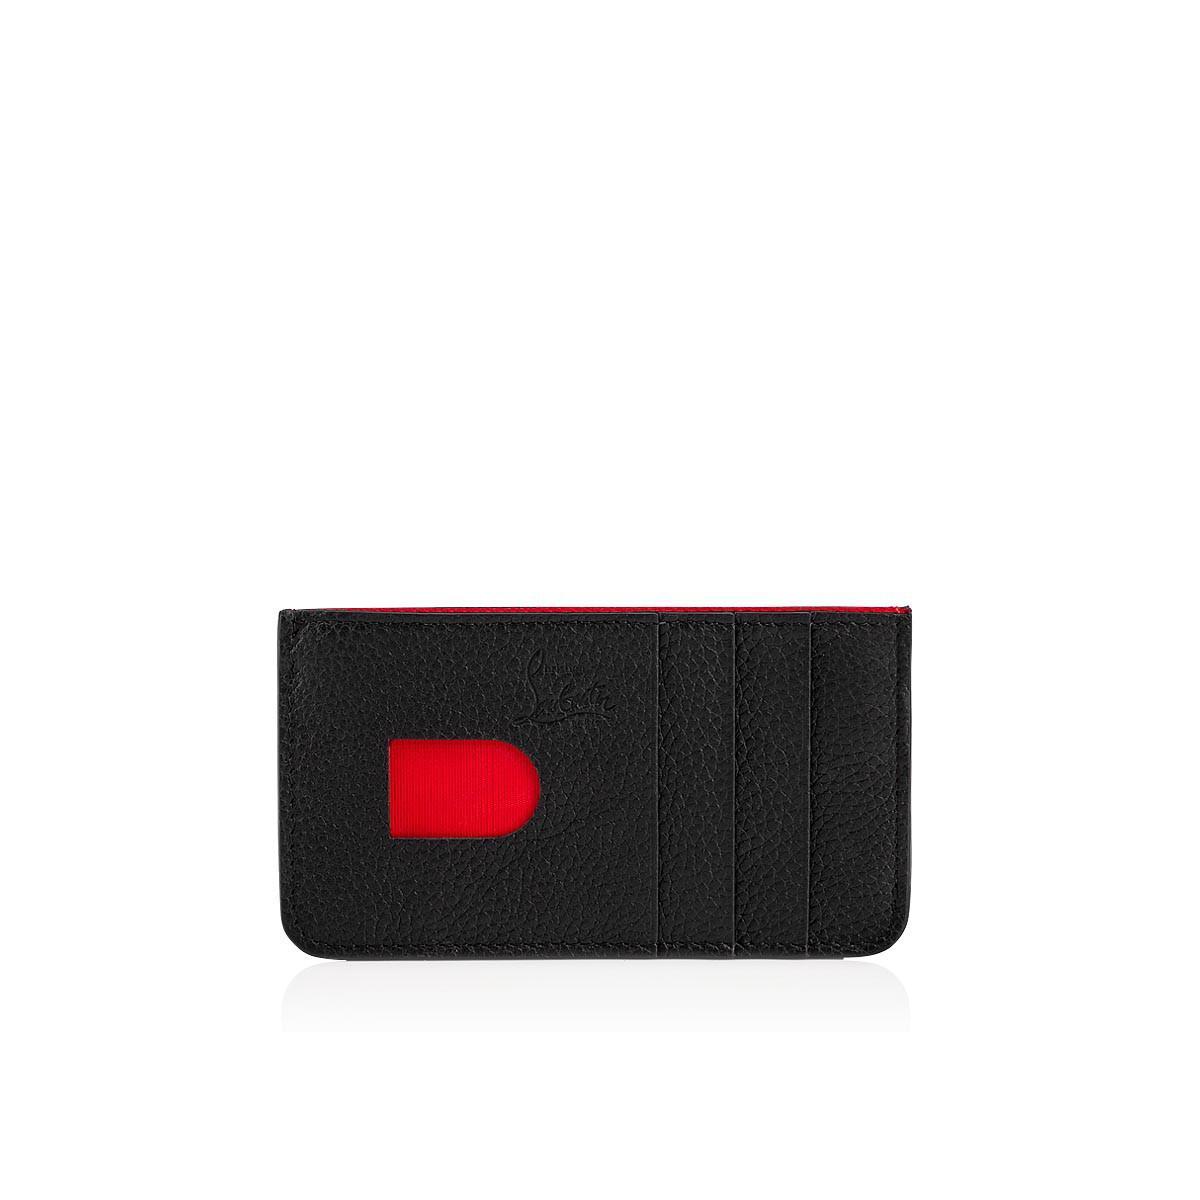 39e0cf31ffc5 Christian Louboutin - Black Credilou Cardholder for Men - Lyst. View  fullscreen